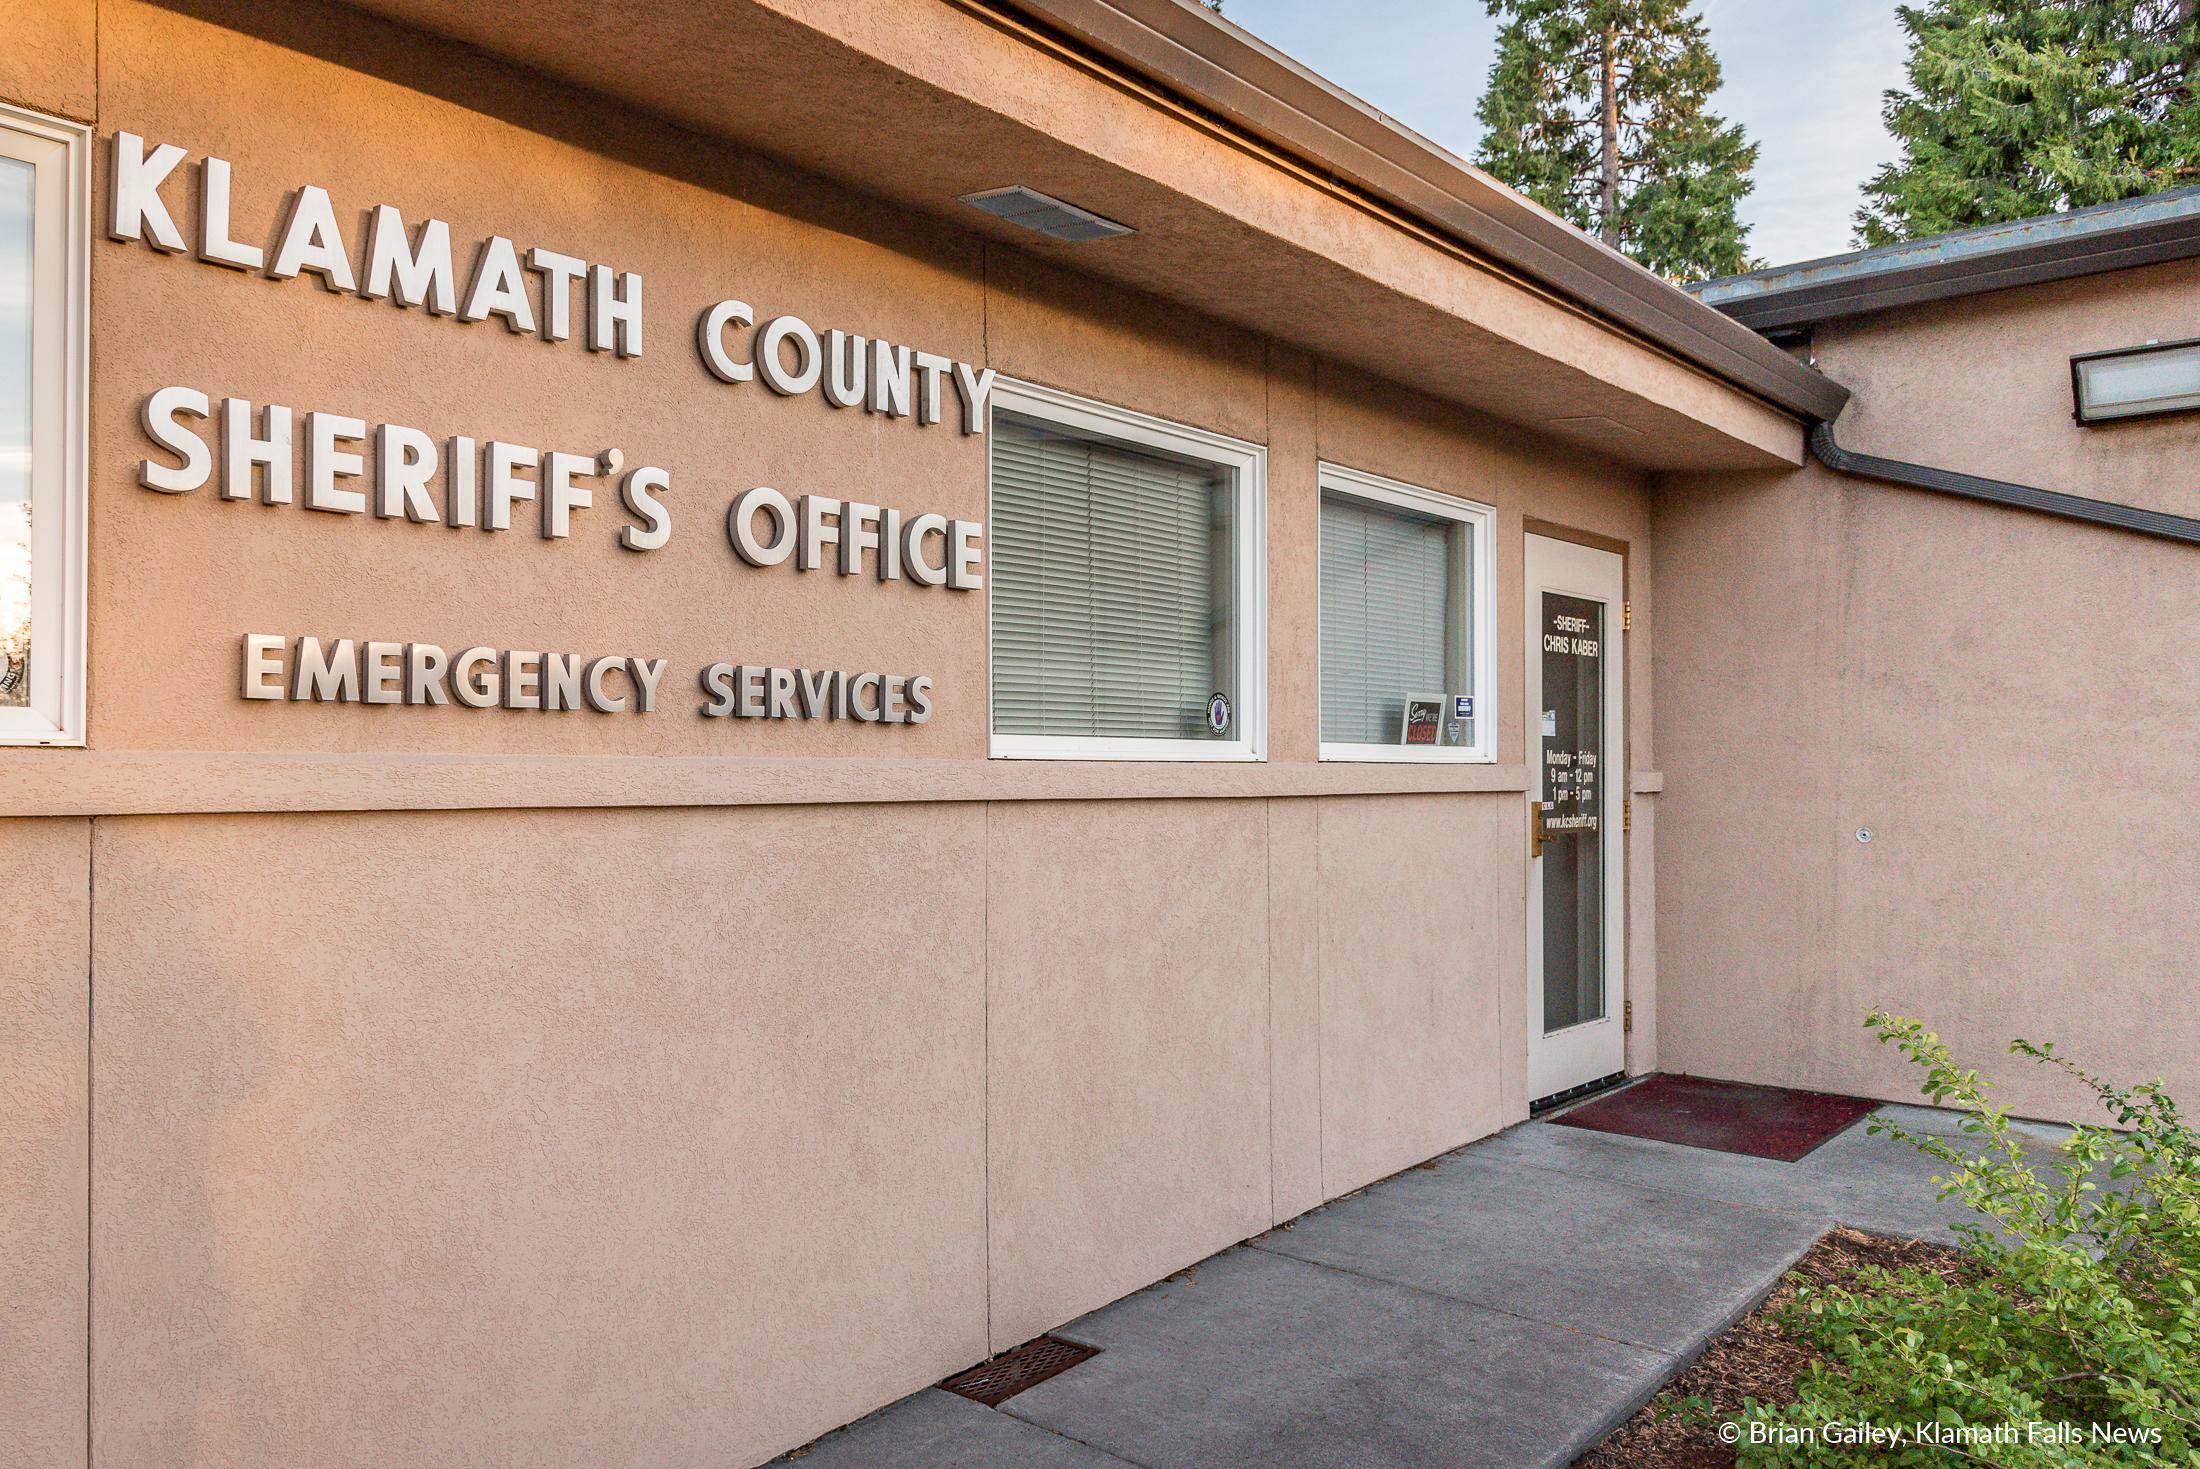 Klamath County Sheriff's Office, File Photo (Brian Gailey)